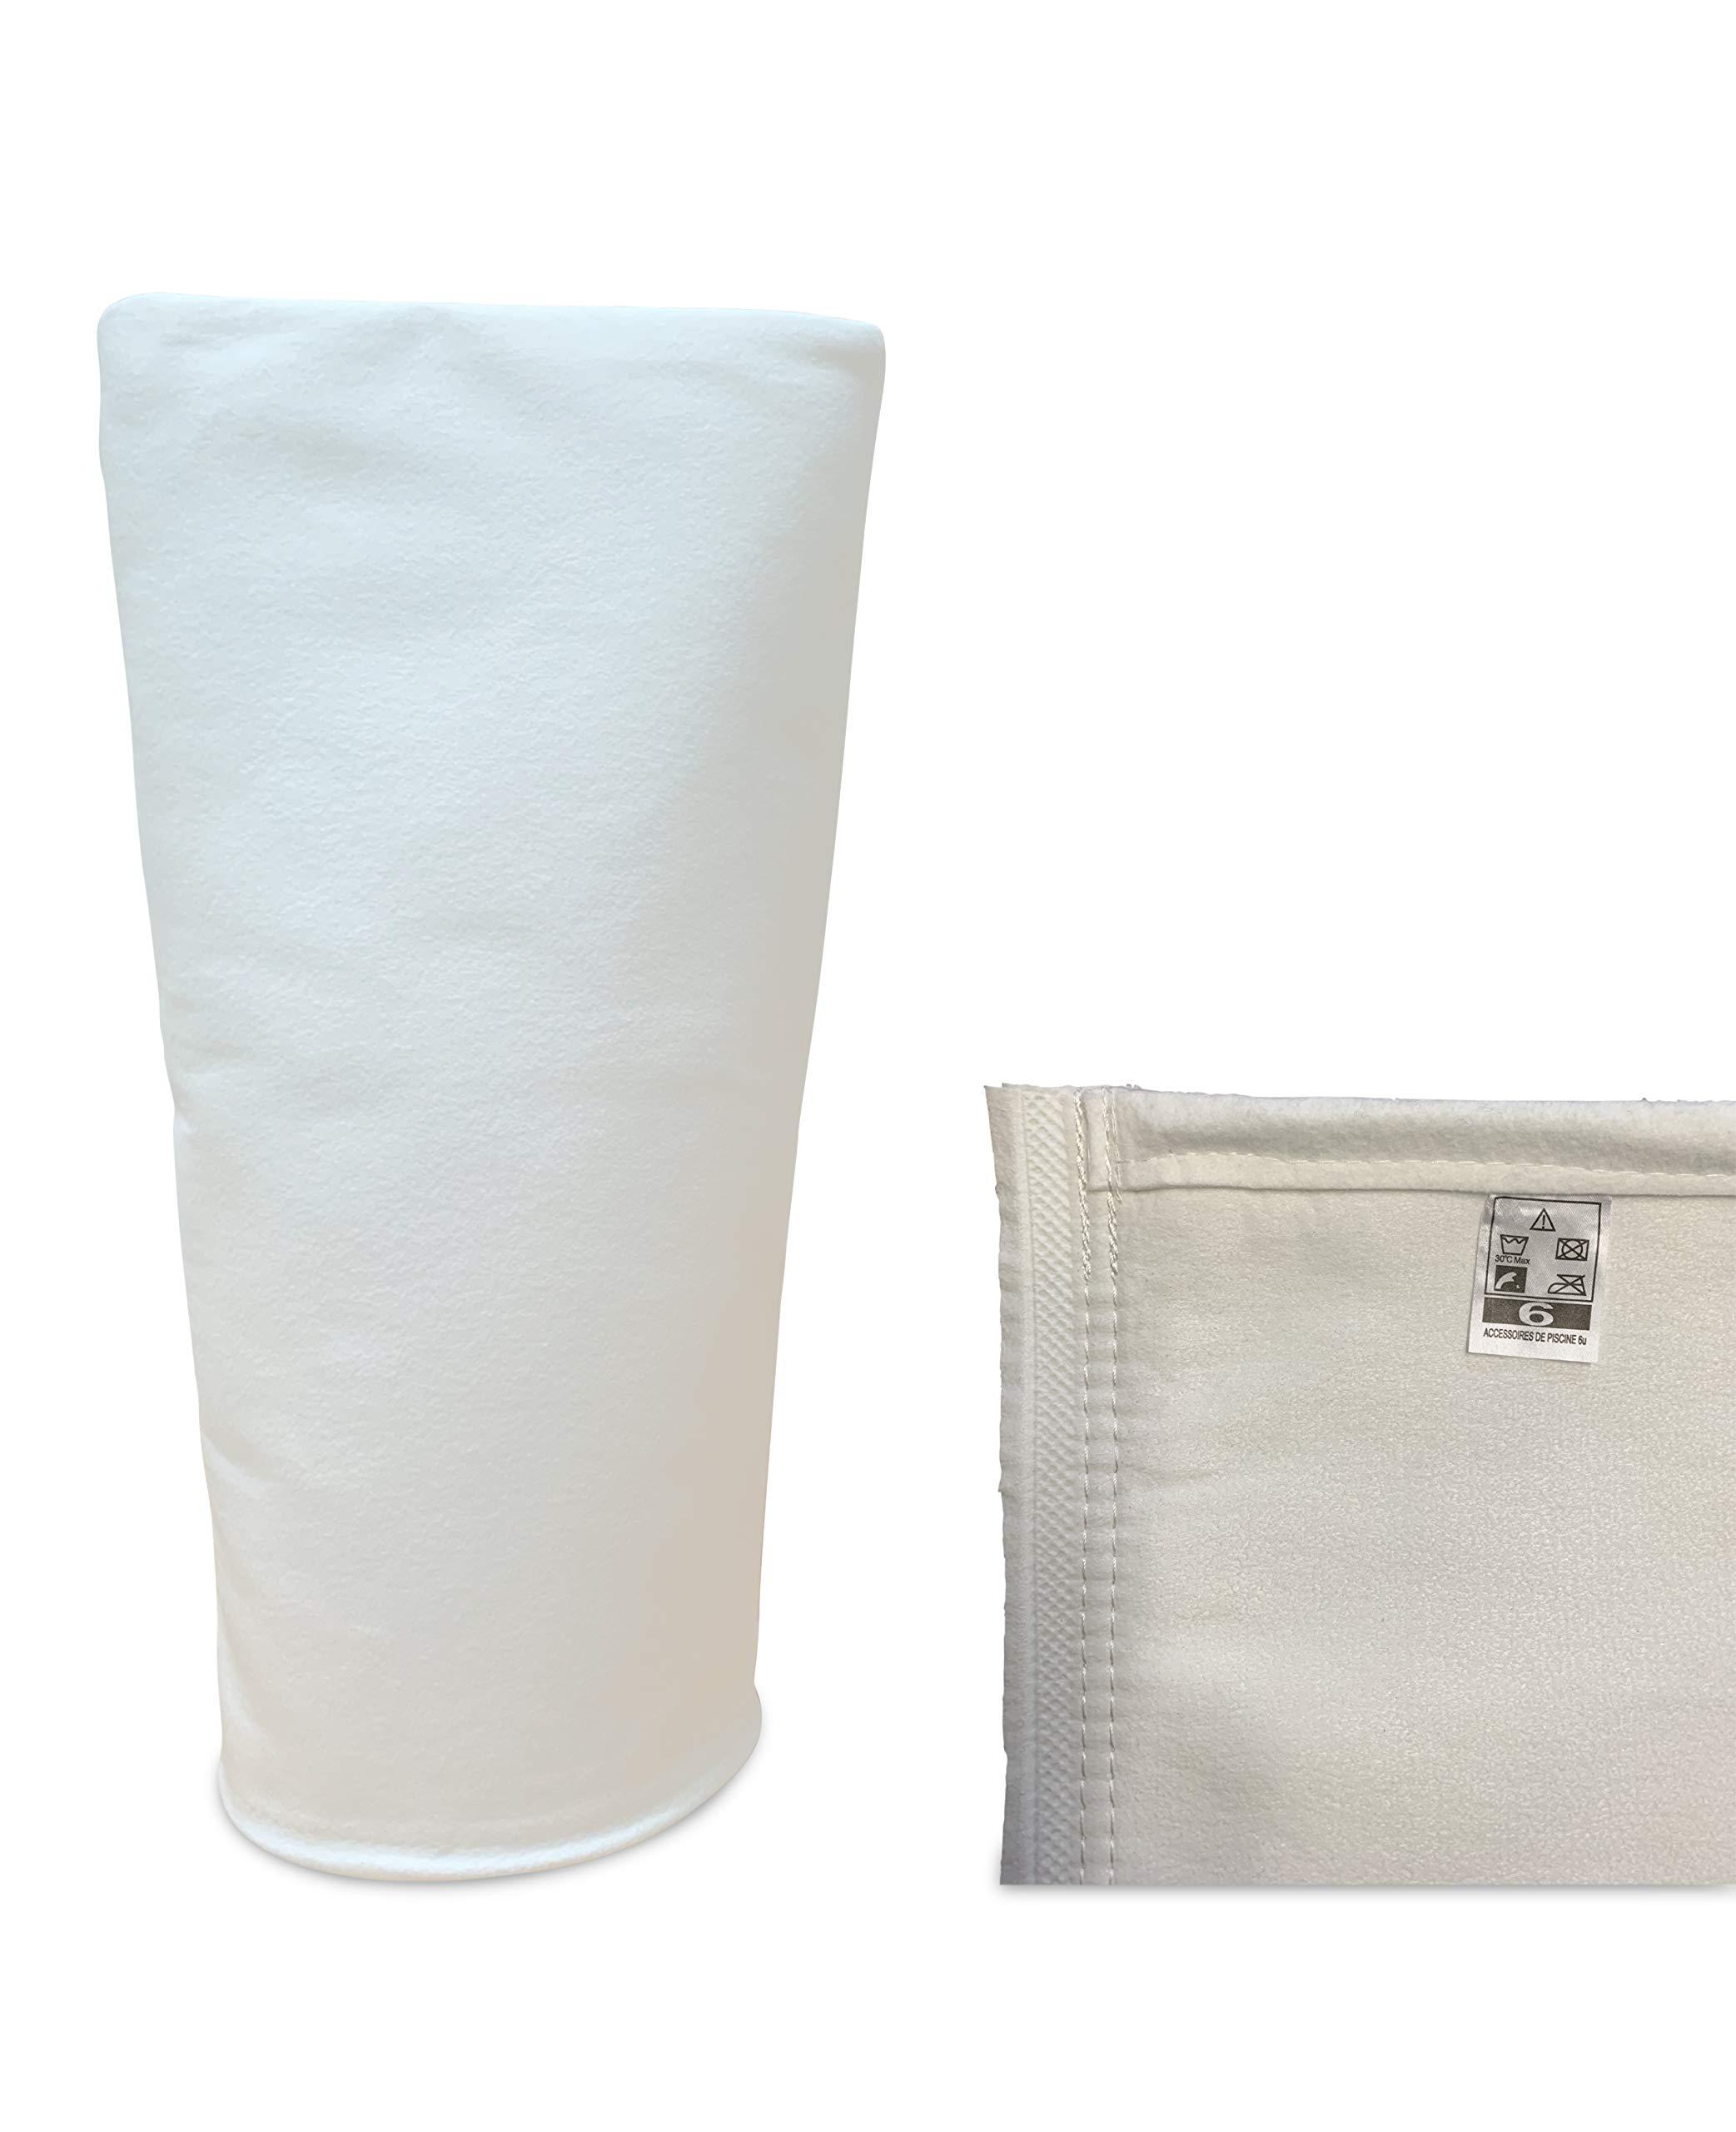 Filter pocket compatible Desjoyaux pools 1 year warranty 6 microns